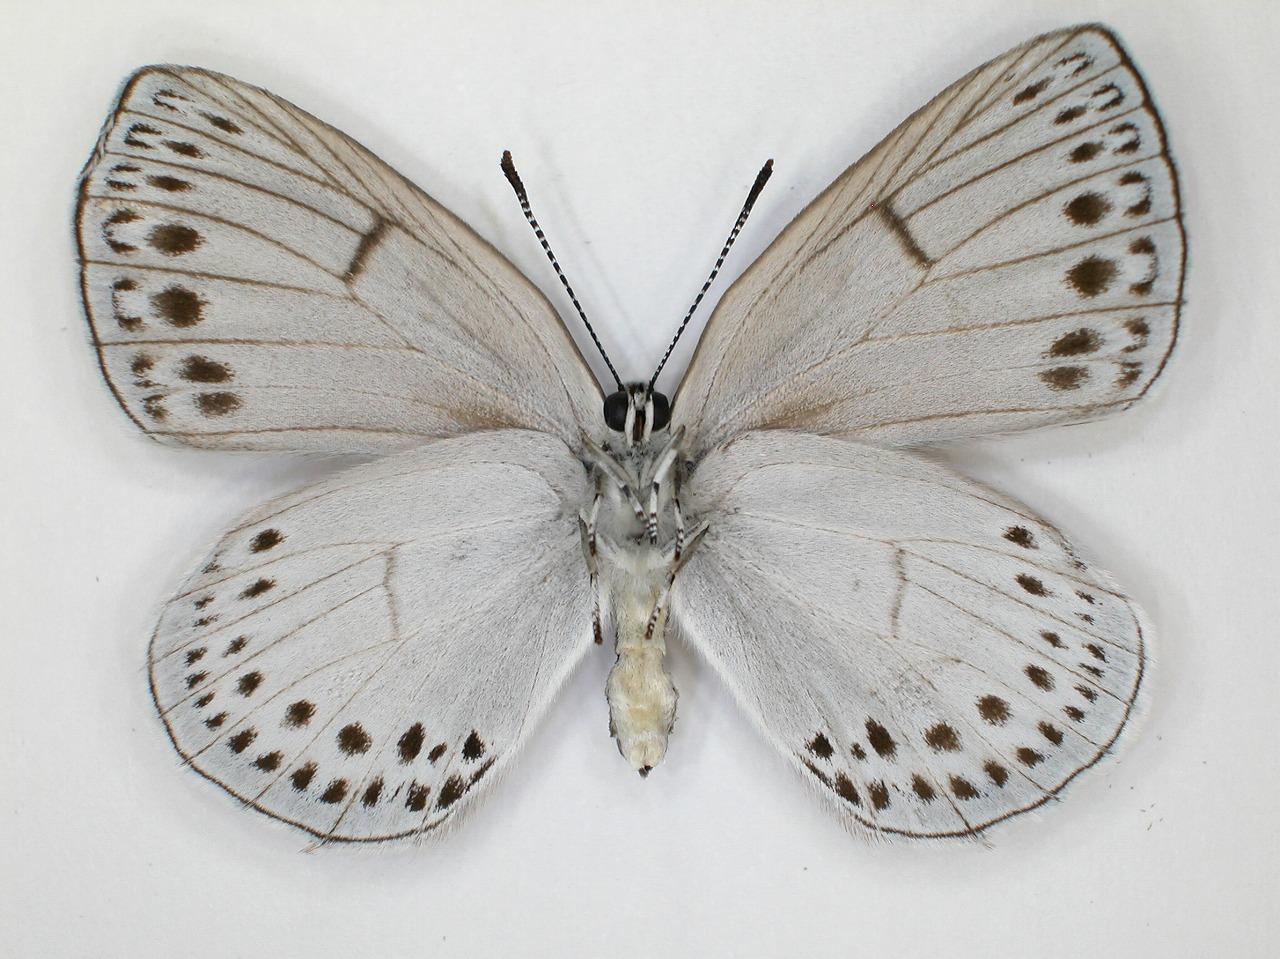 https://www.hitohaku.jp/material/l-material/butterfly-wing/5-lycaenidae/B1-637834_B.jpg